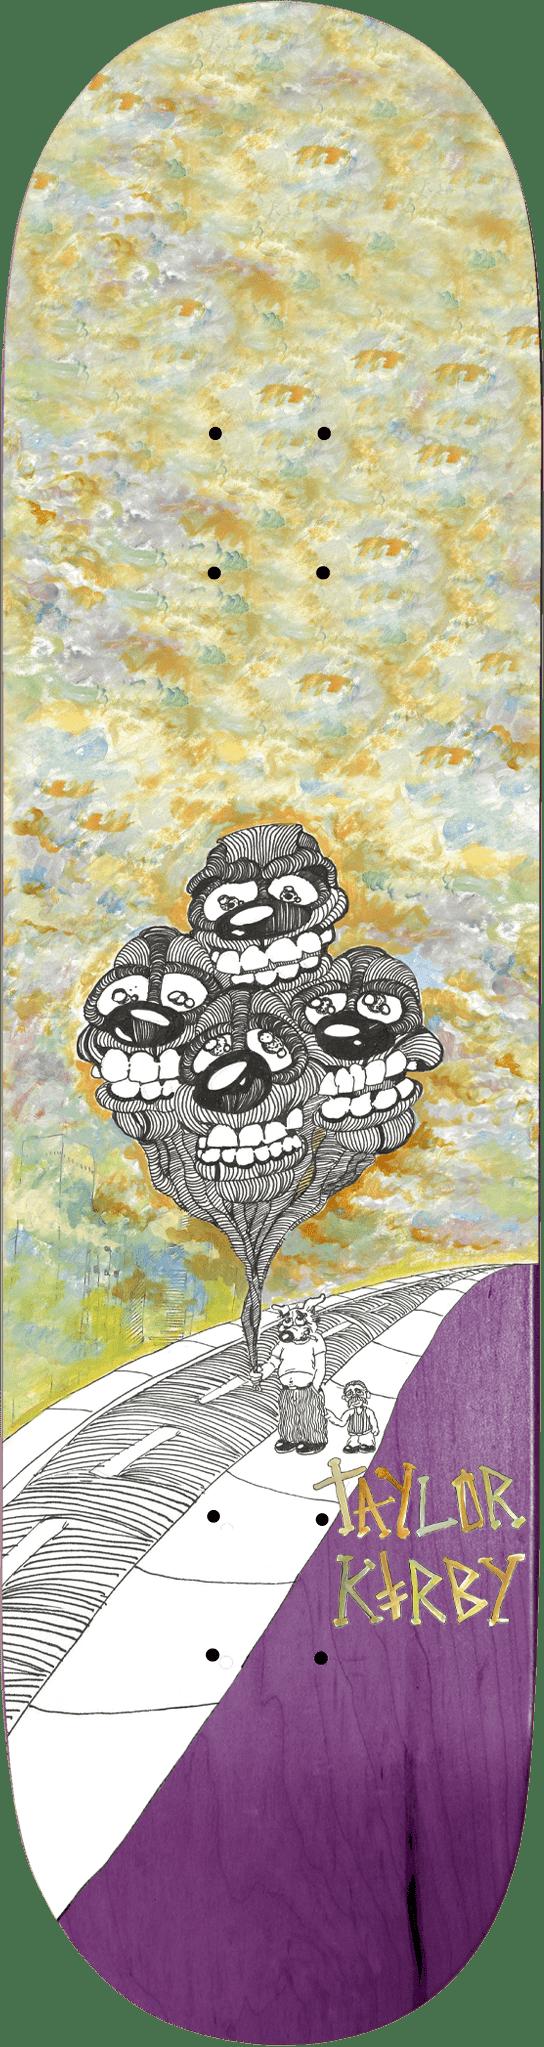 "Kirby Mice & Men Deck   8.25""   Deck by Deathwish 1"